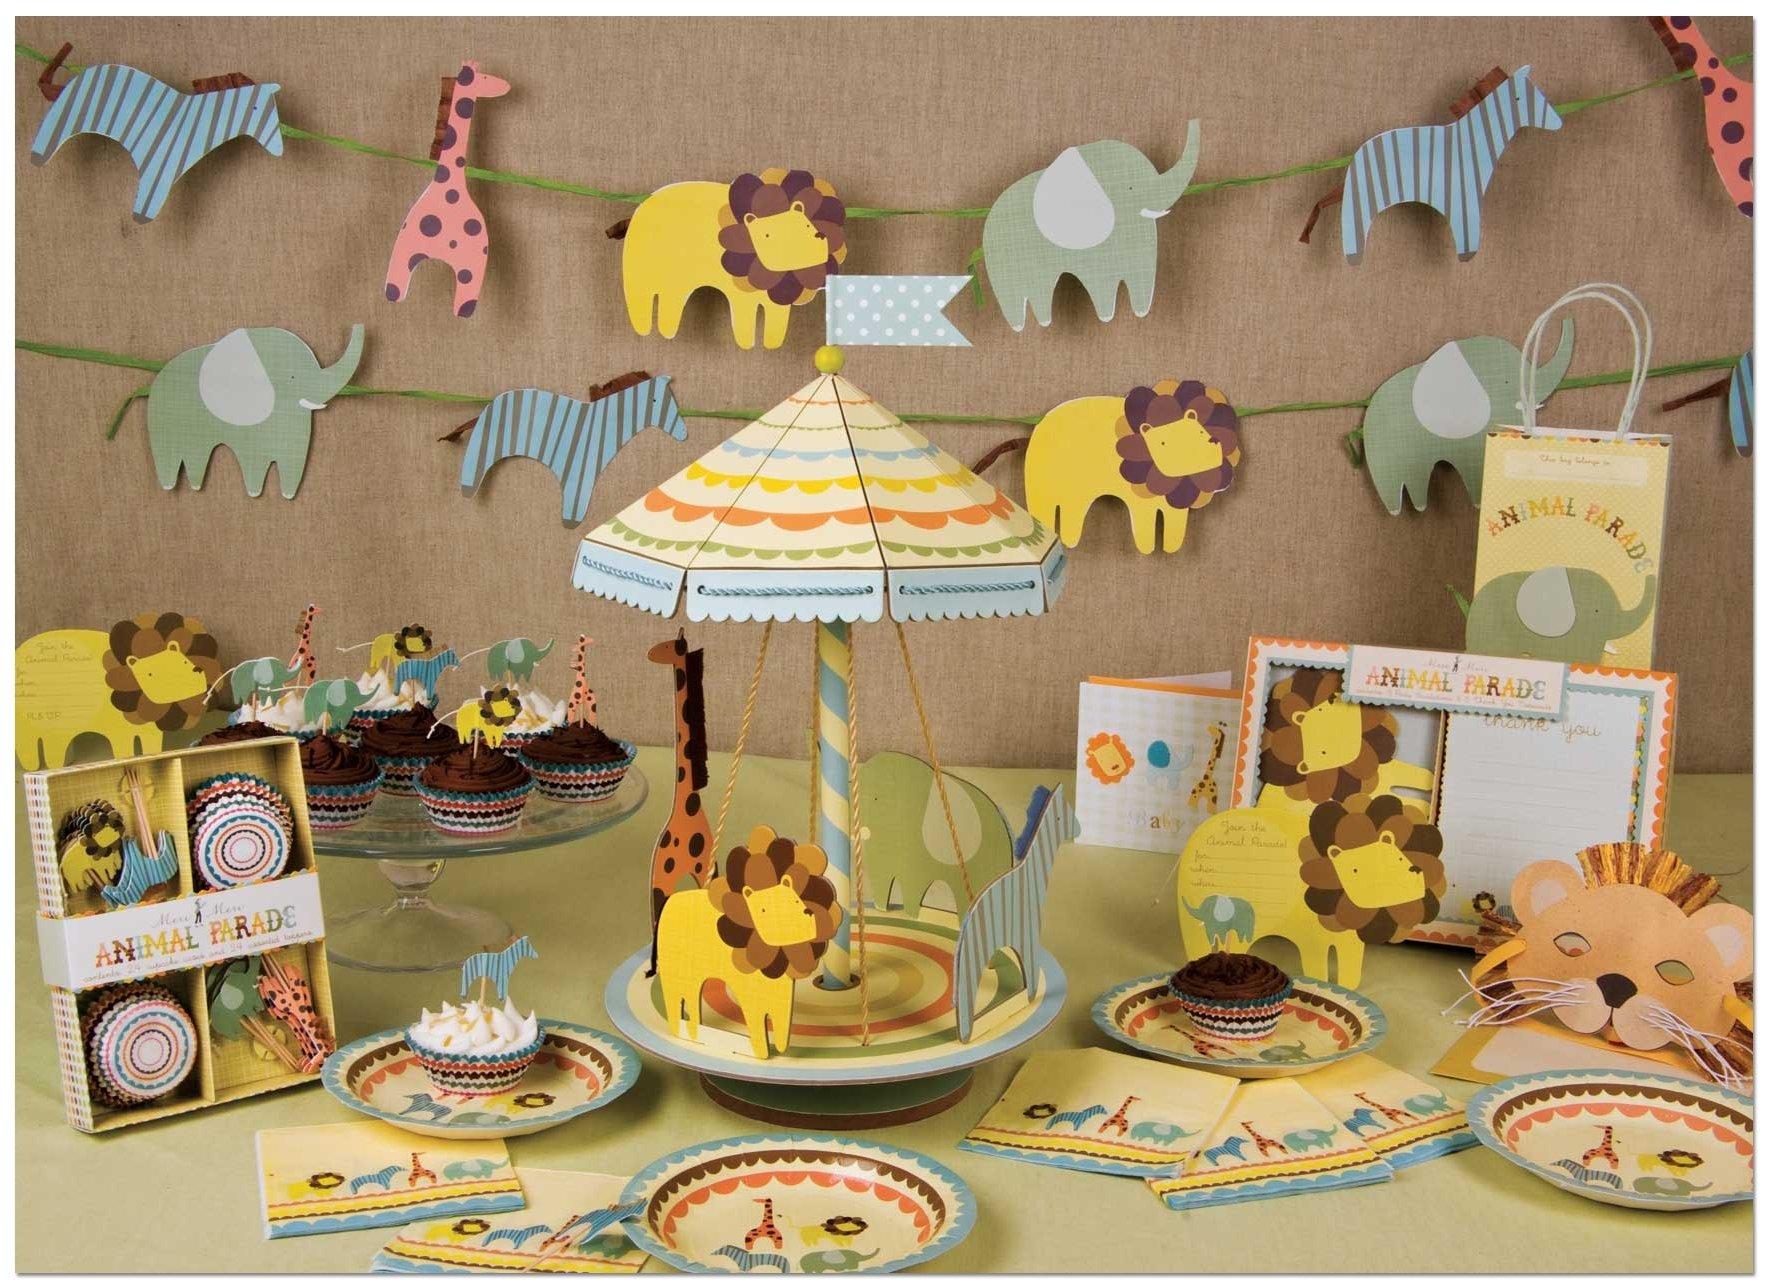 10 Spectacular Animal Themed Birthday Party Ideas animal party decoration ideas weddings eve loversiq 2020